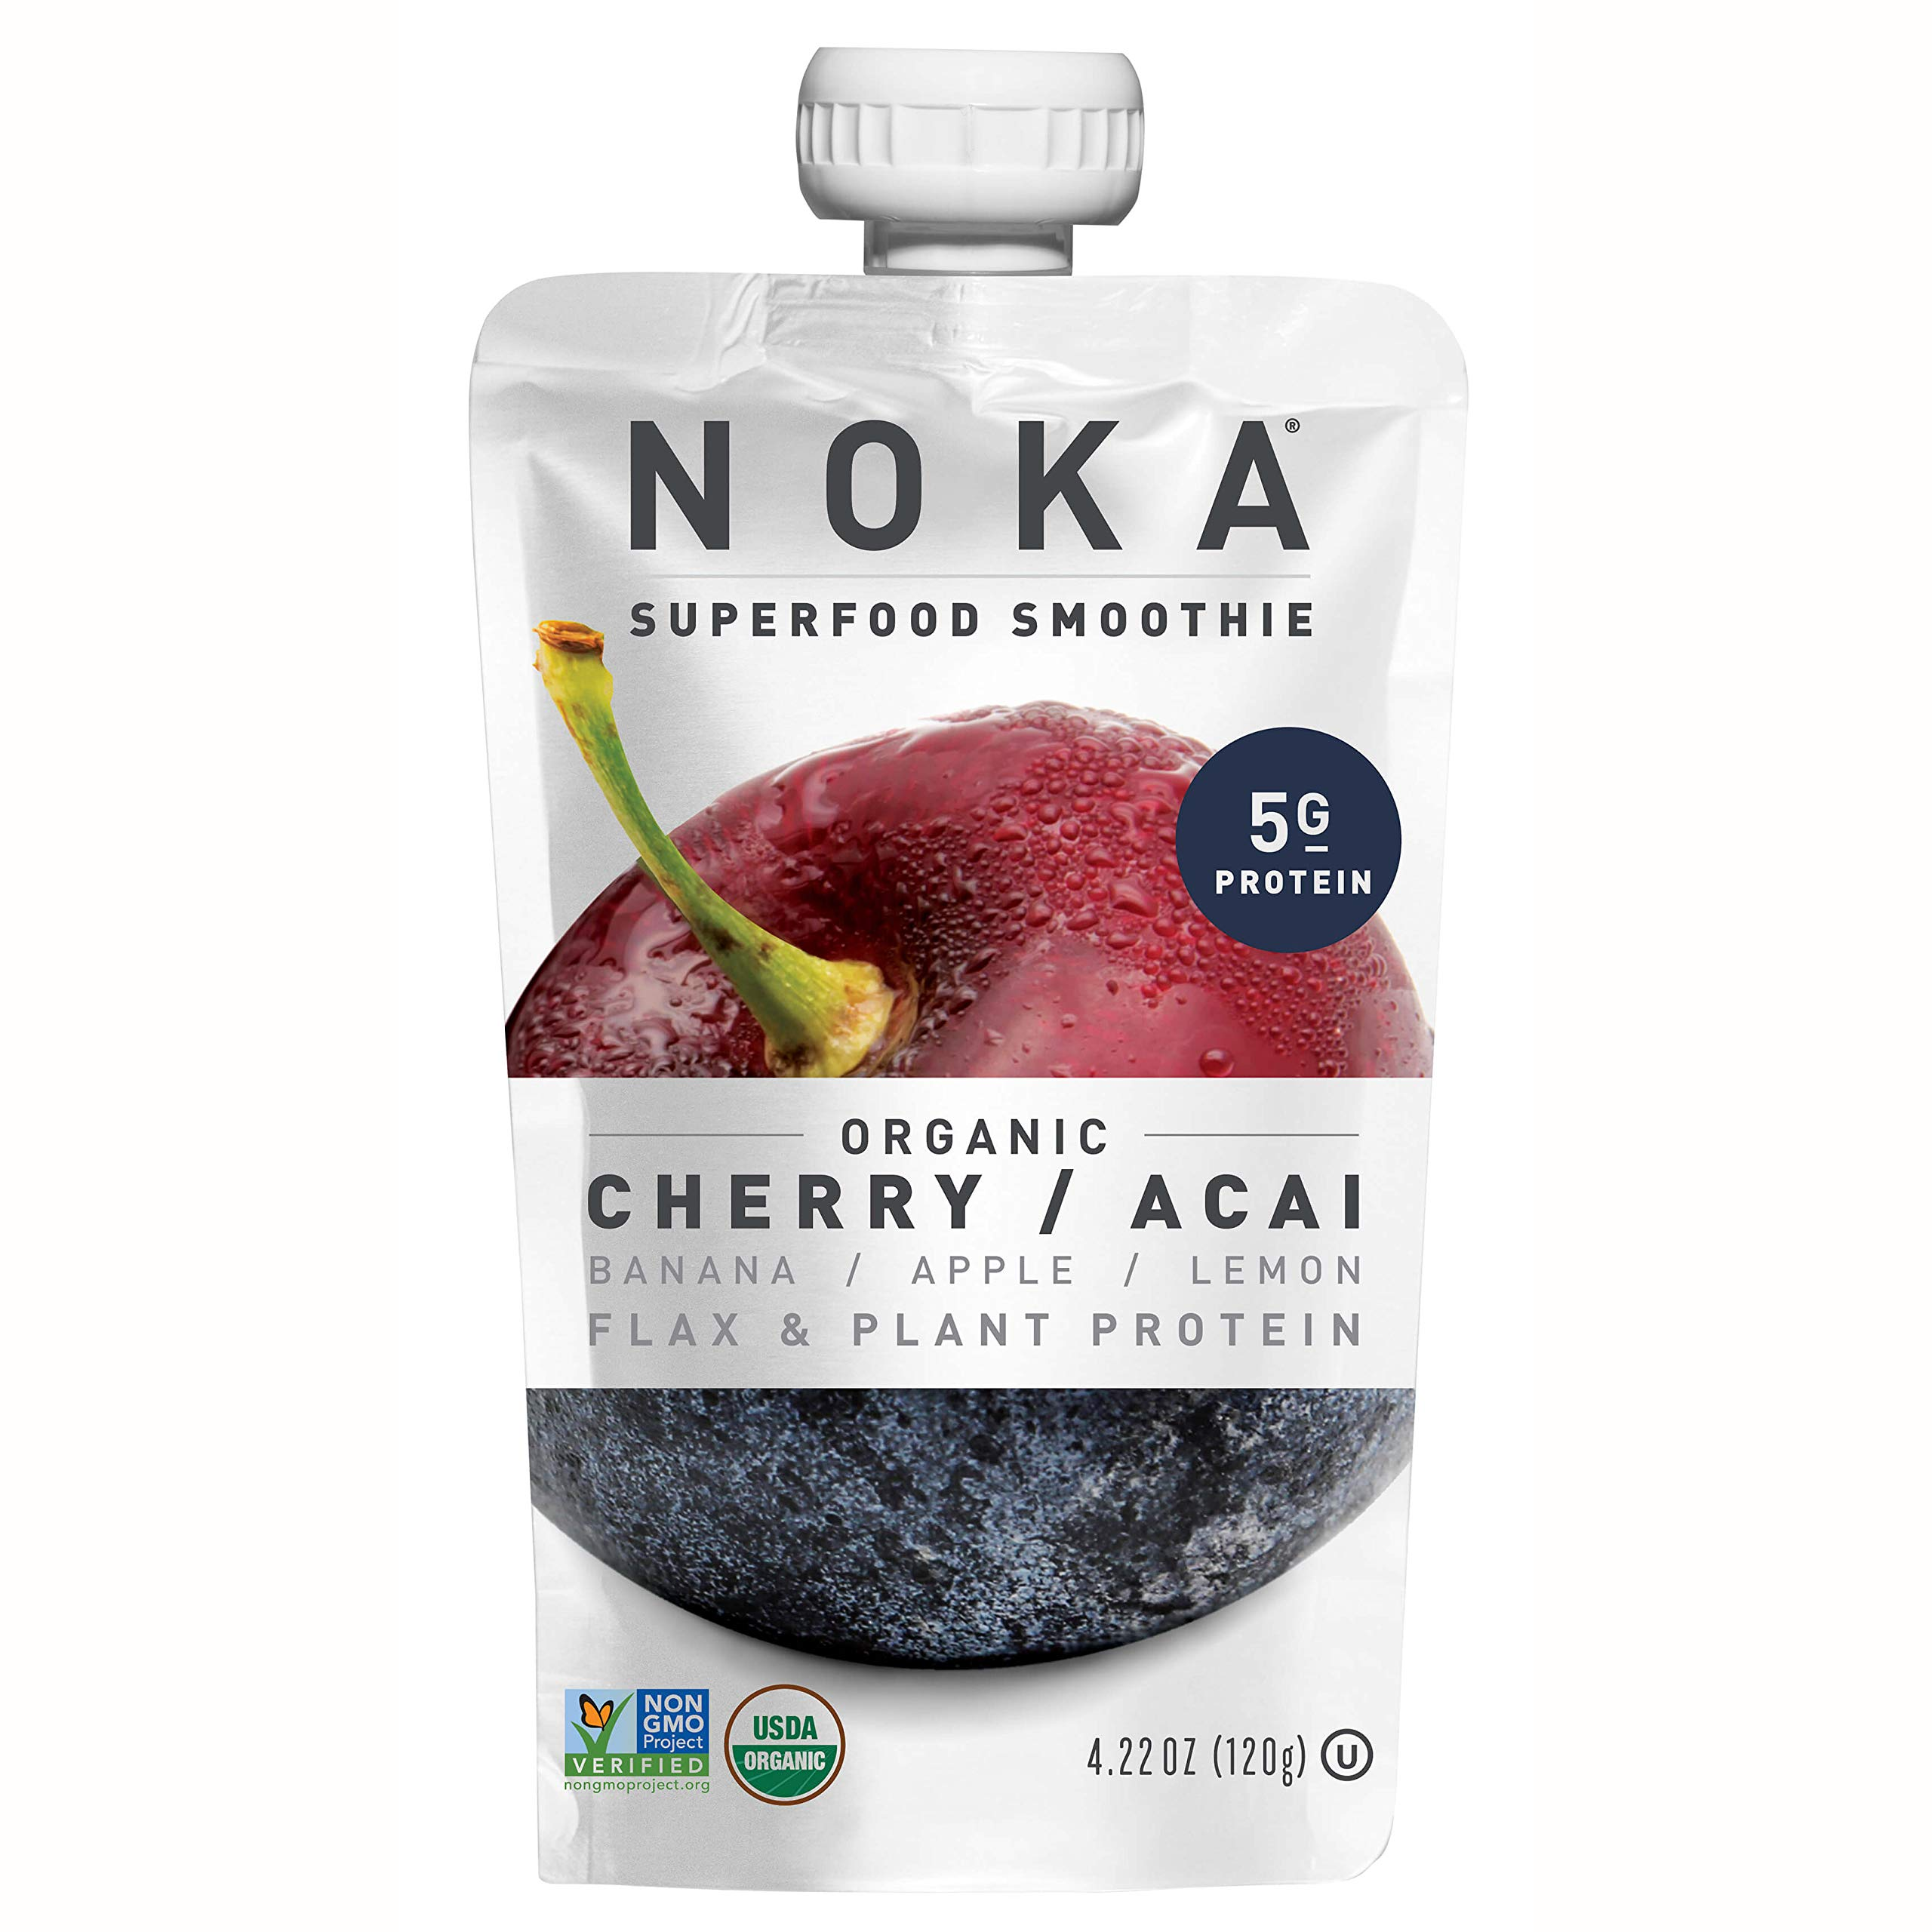 NOKA Superfood Pouches (Cherry Acai) 12 Pack | 100% Organic Fruit And Veggie Smoothie Squeeze Packs | Non GMO, Gluten Free, Vegan, 5g Plant Protein | 4.2oz Each